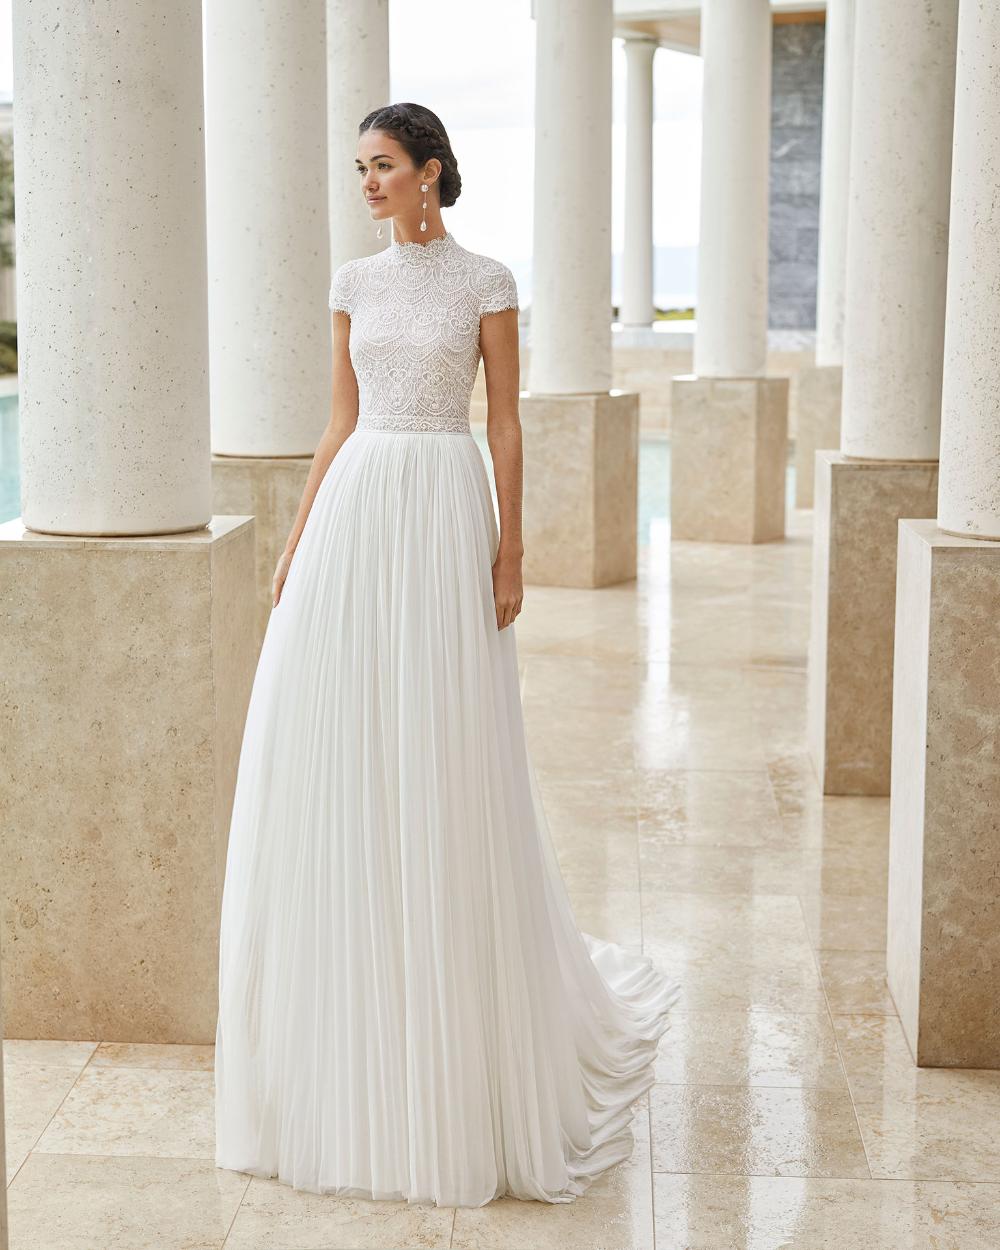 Salina Bridal 2020 Rosa Clara Couture Collection In 2020 Short Sleeve Wedding Dress High Neck Wedding Dress Stylish Wedding Dresses